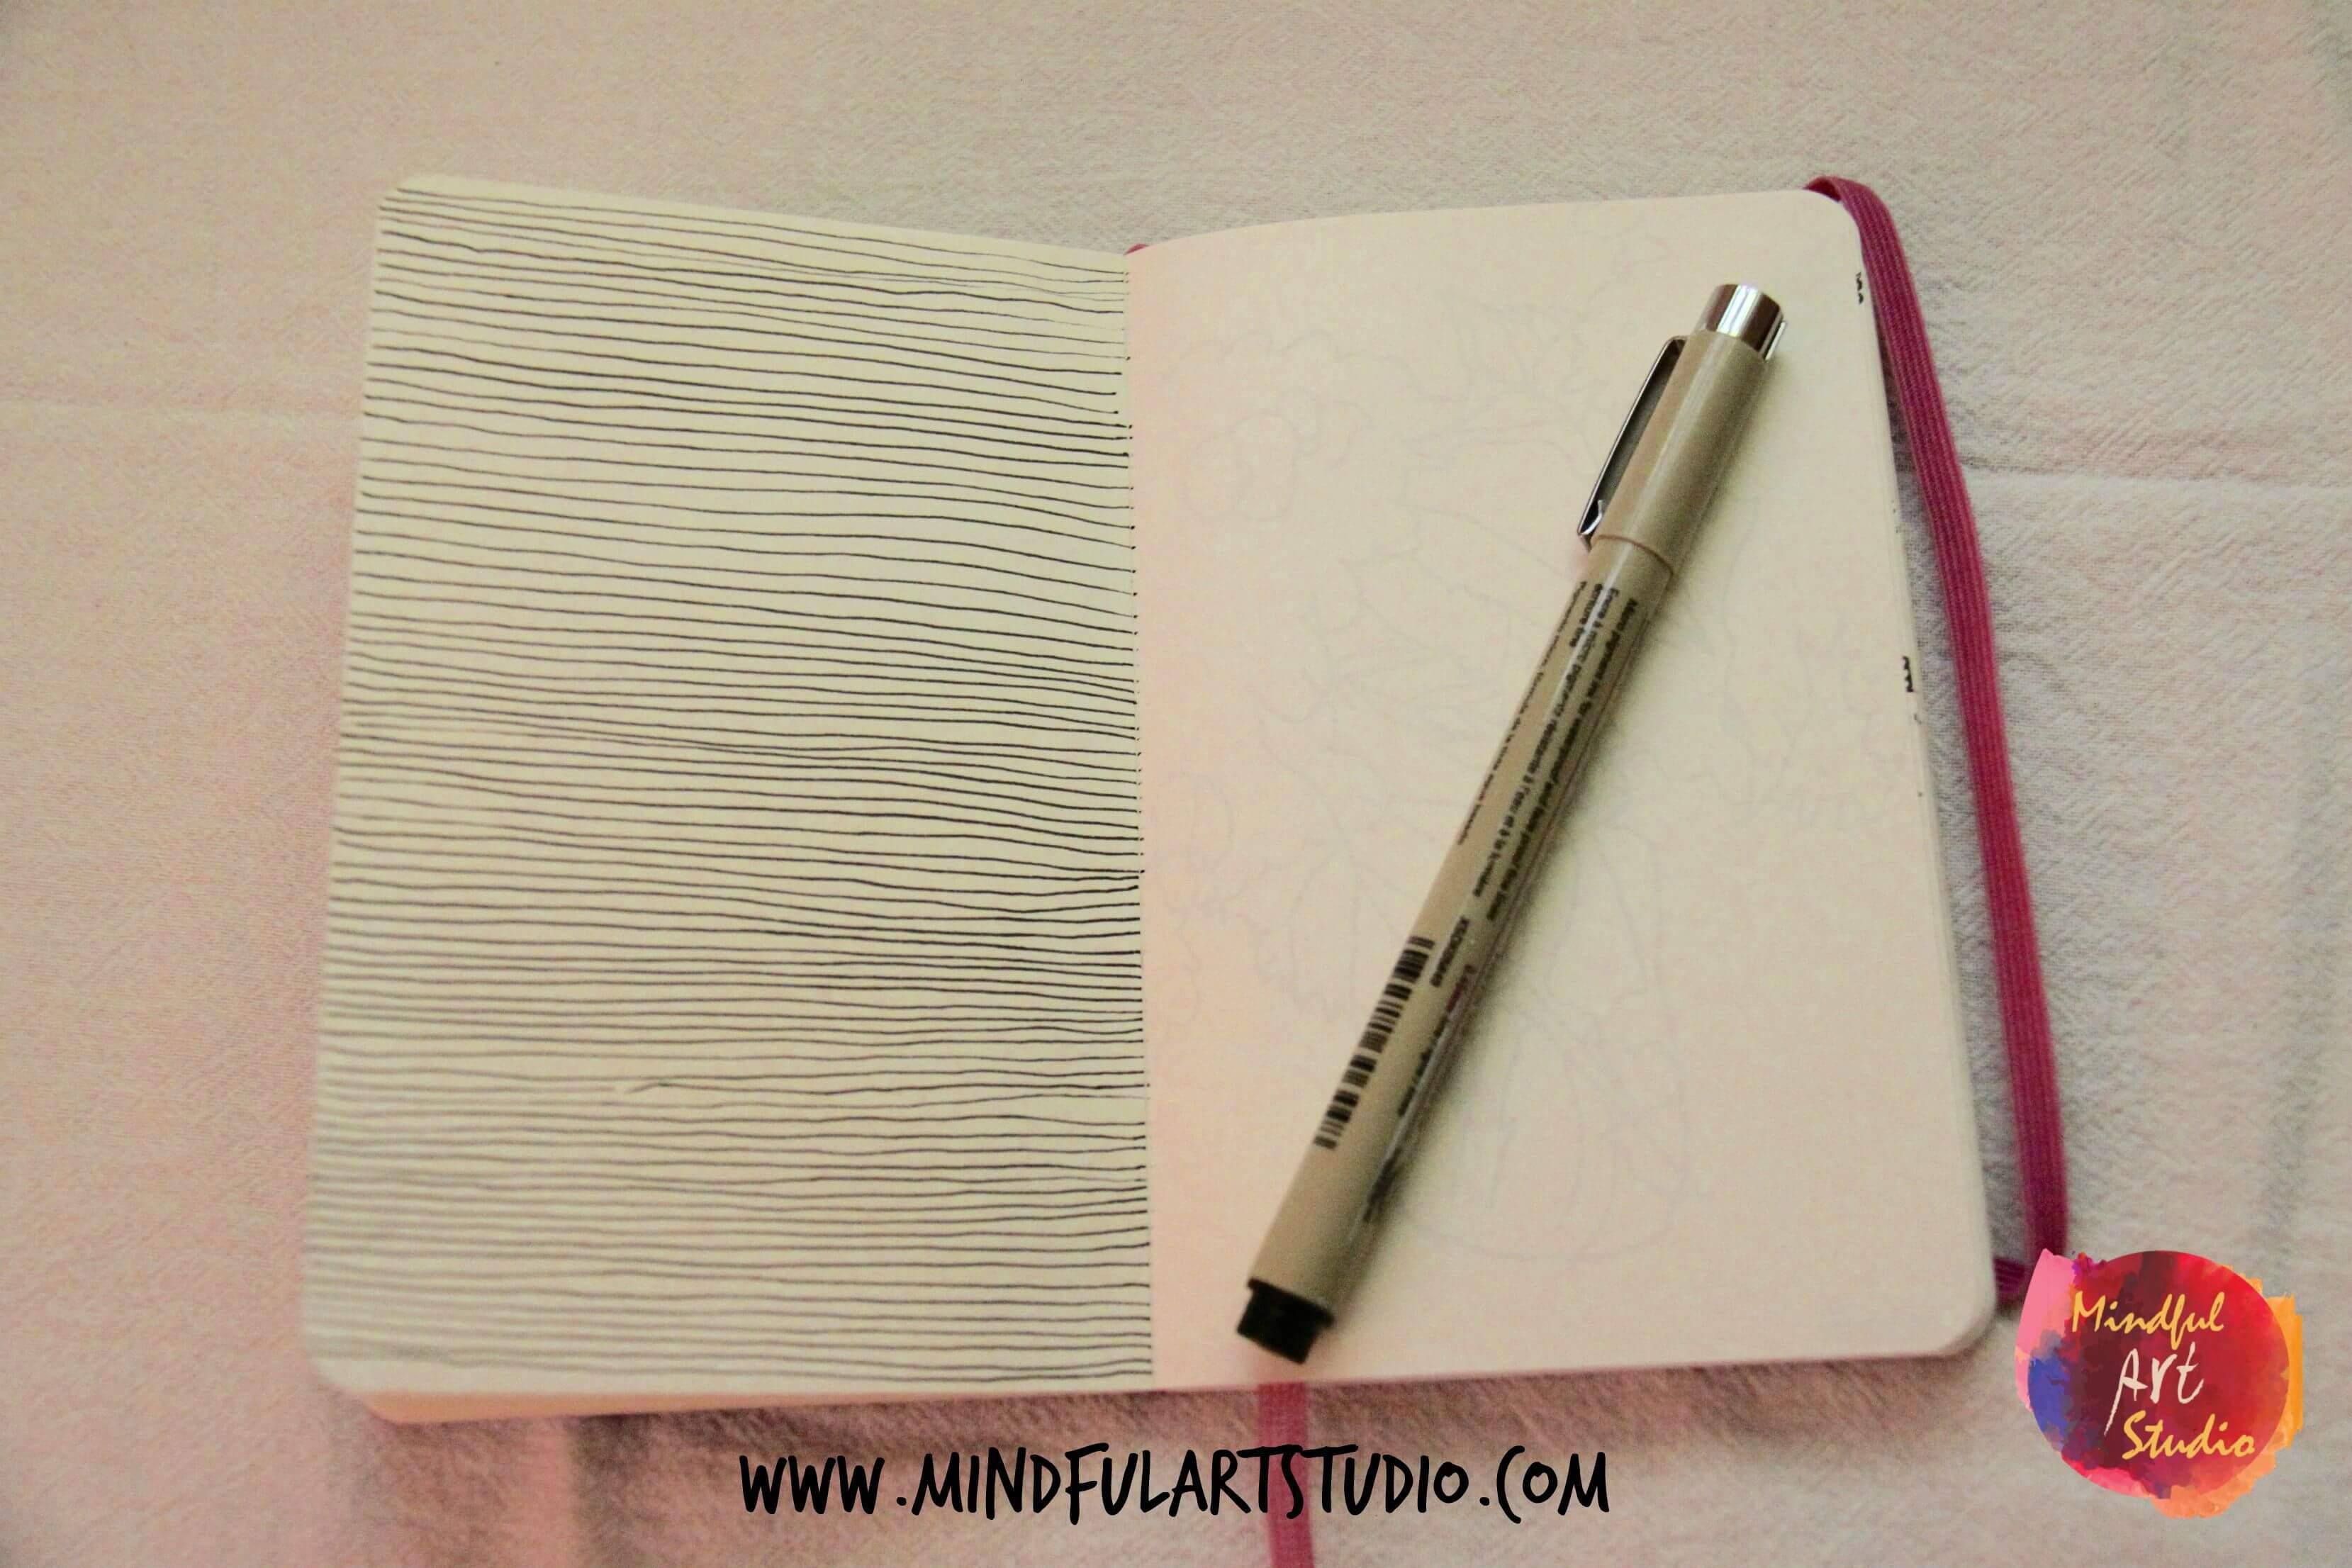 Blind Contour Line Drawing Definition : Blind contour drawing archives mindful art studio